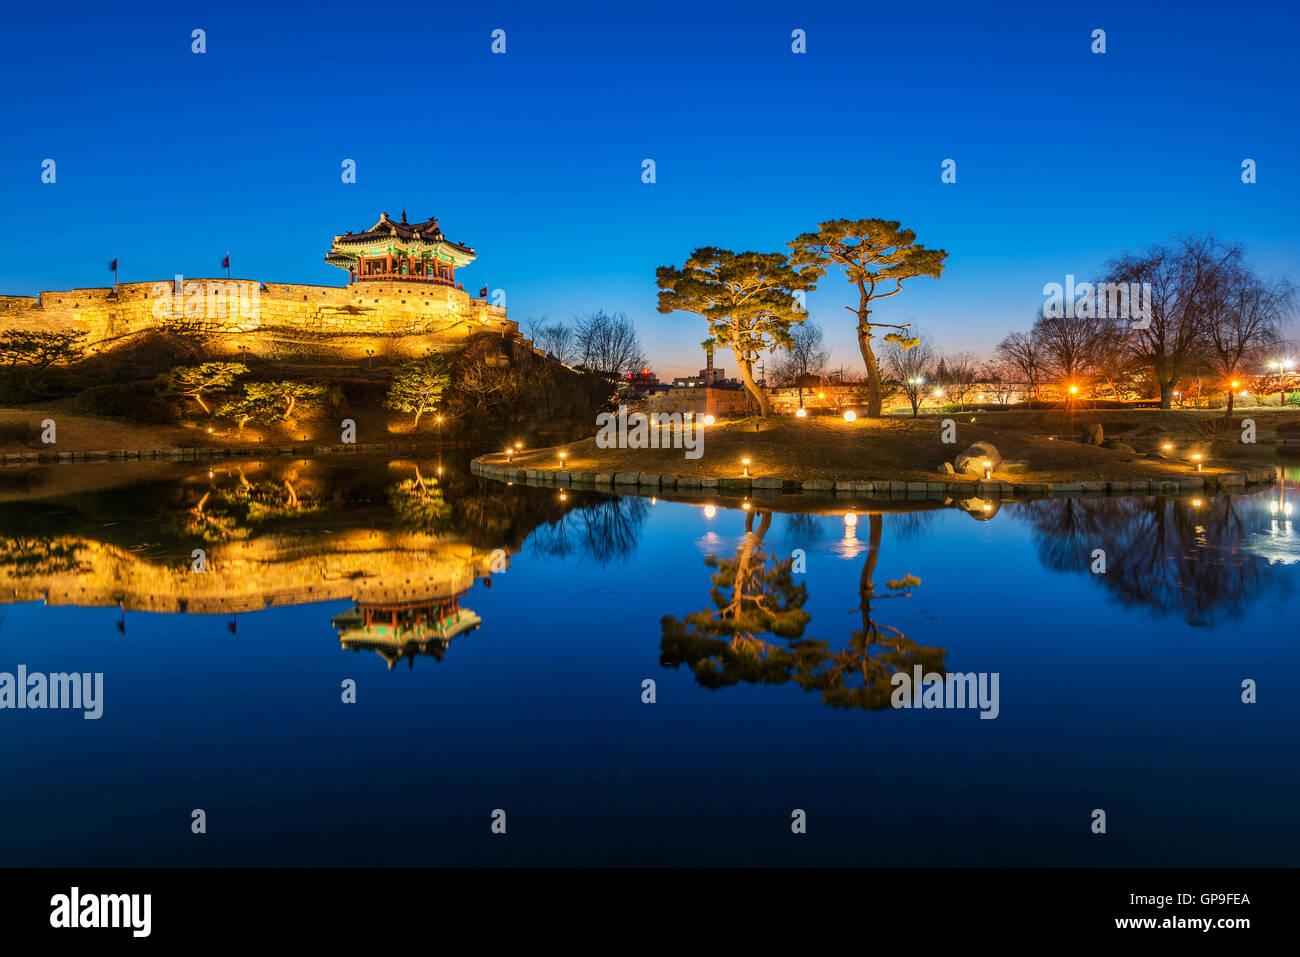 Reflection of Suwon Hwaseong fortres in Suwon,South Korea. - Stock Image